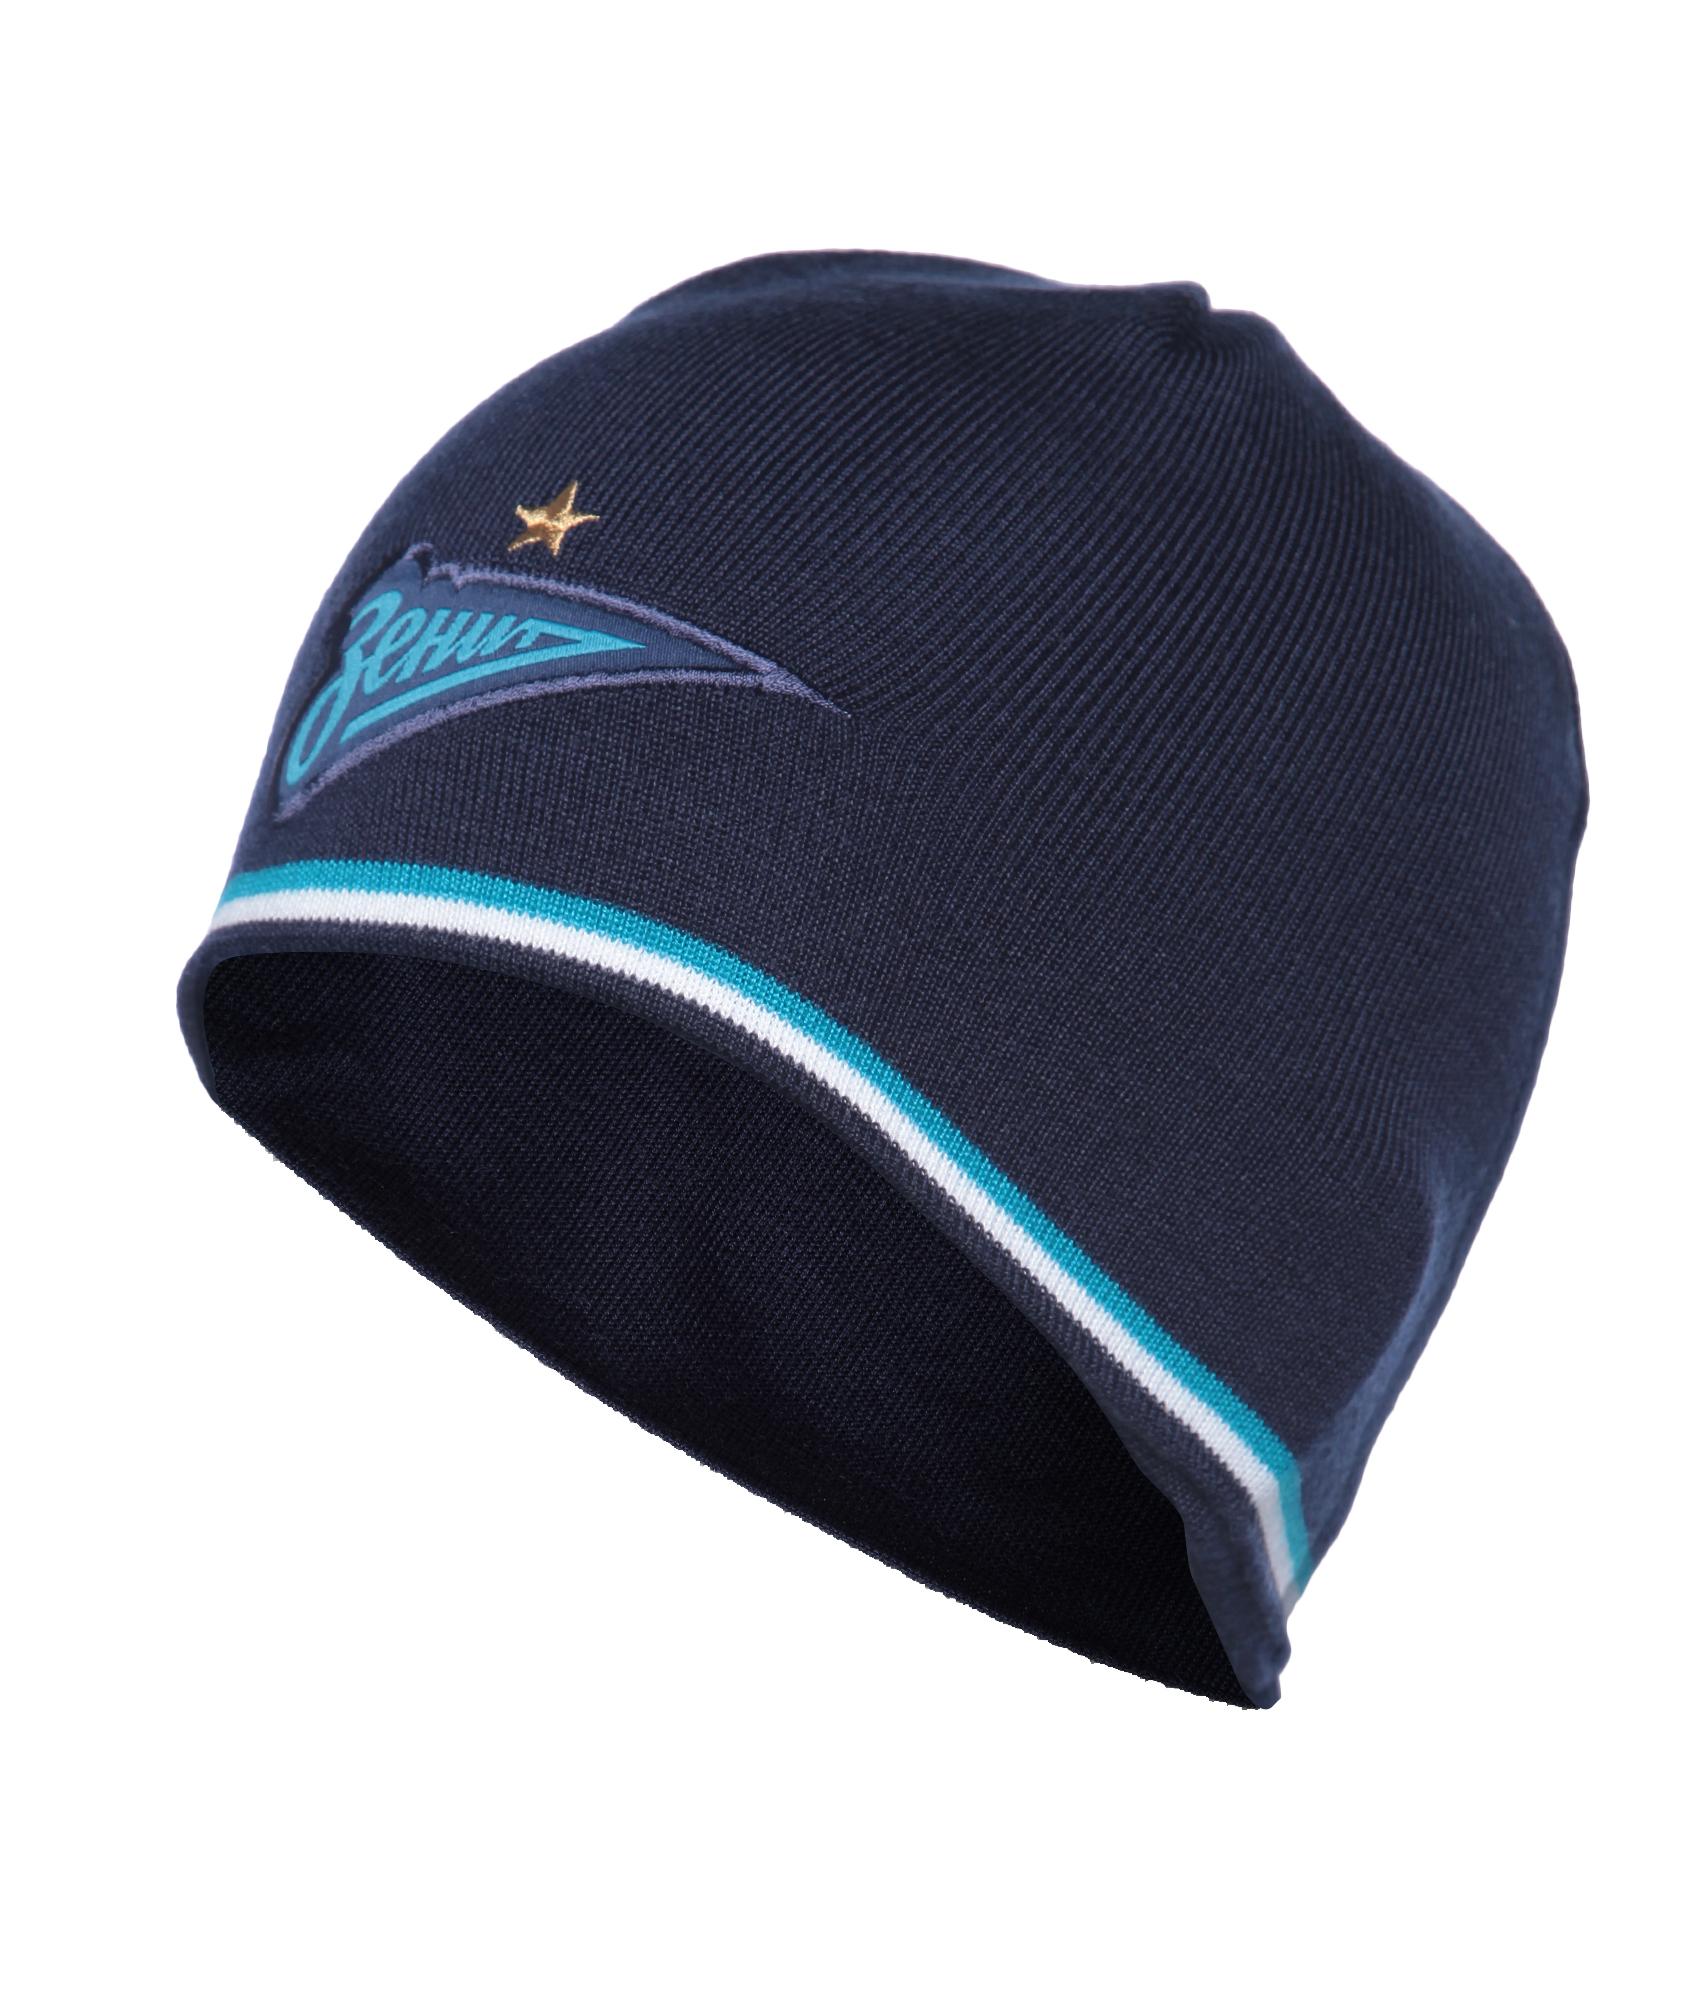 Шапка Зенит Цвет-Темно-Синий шапка мужская зенит